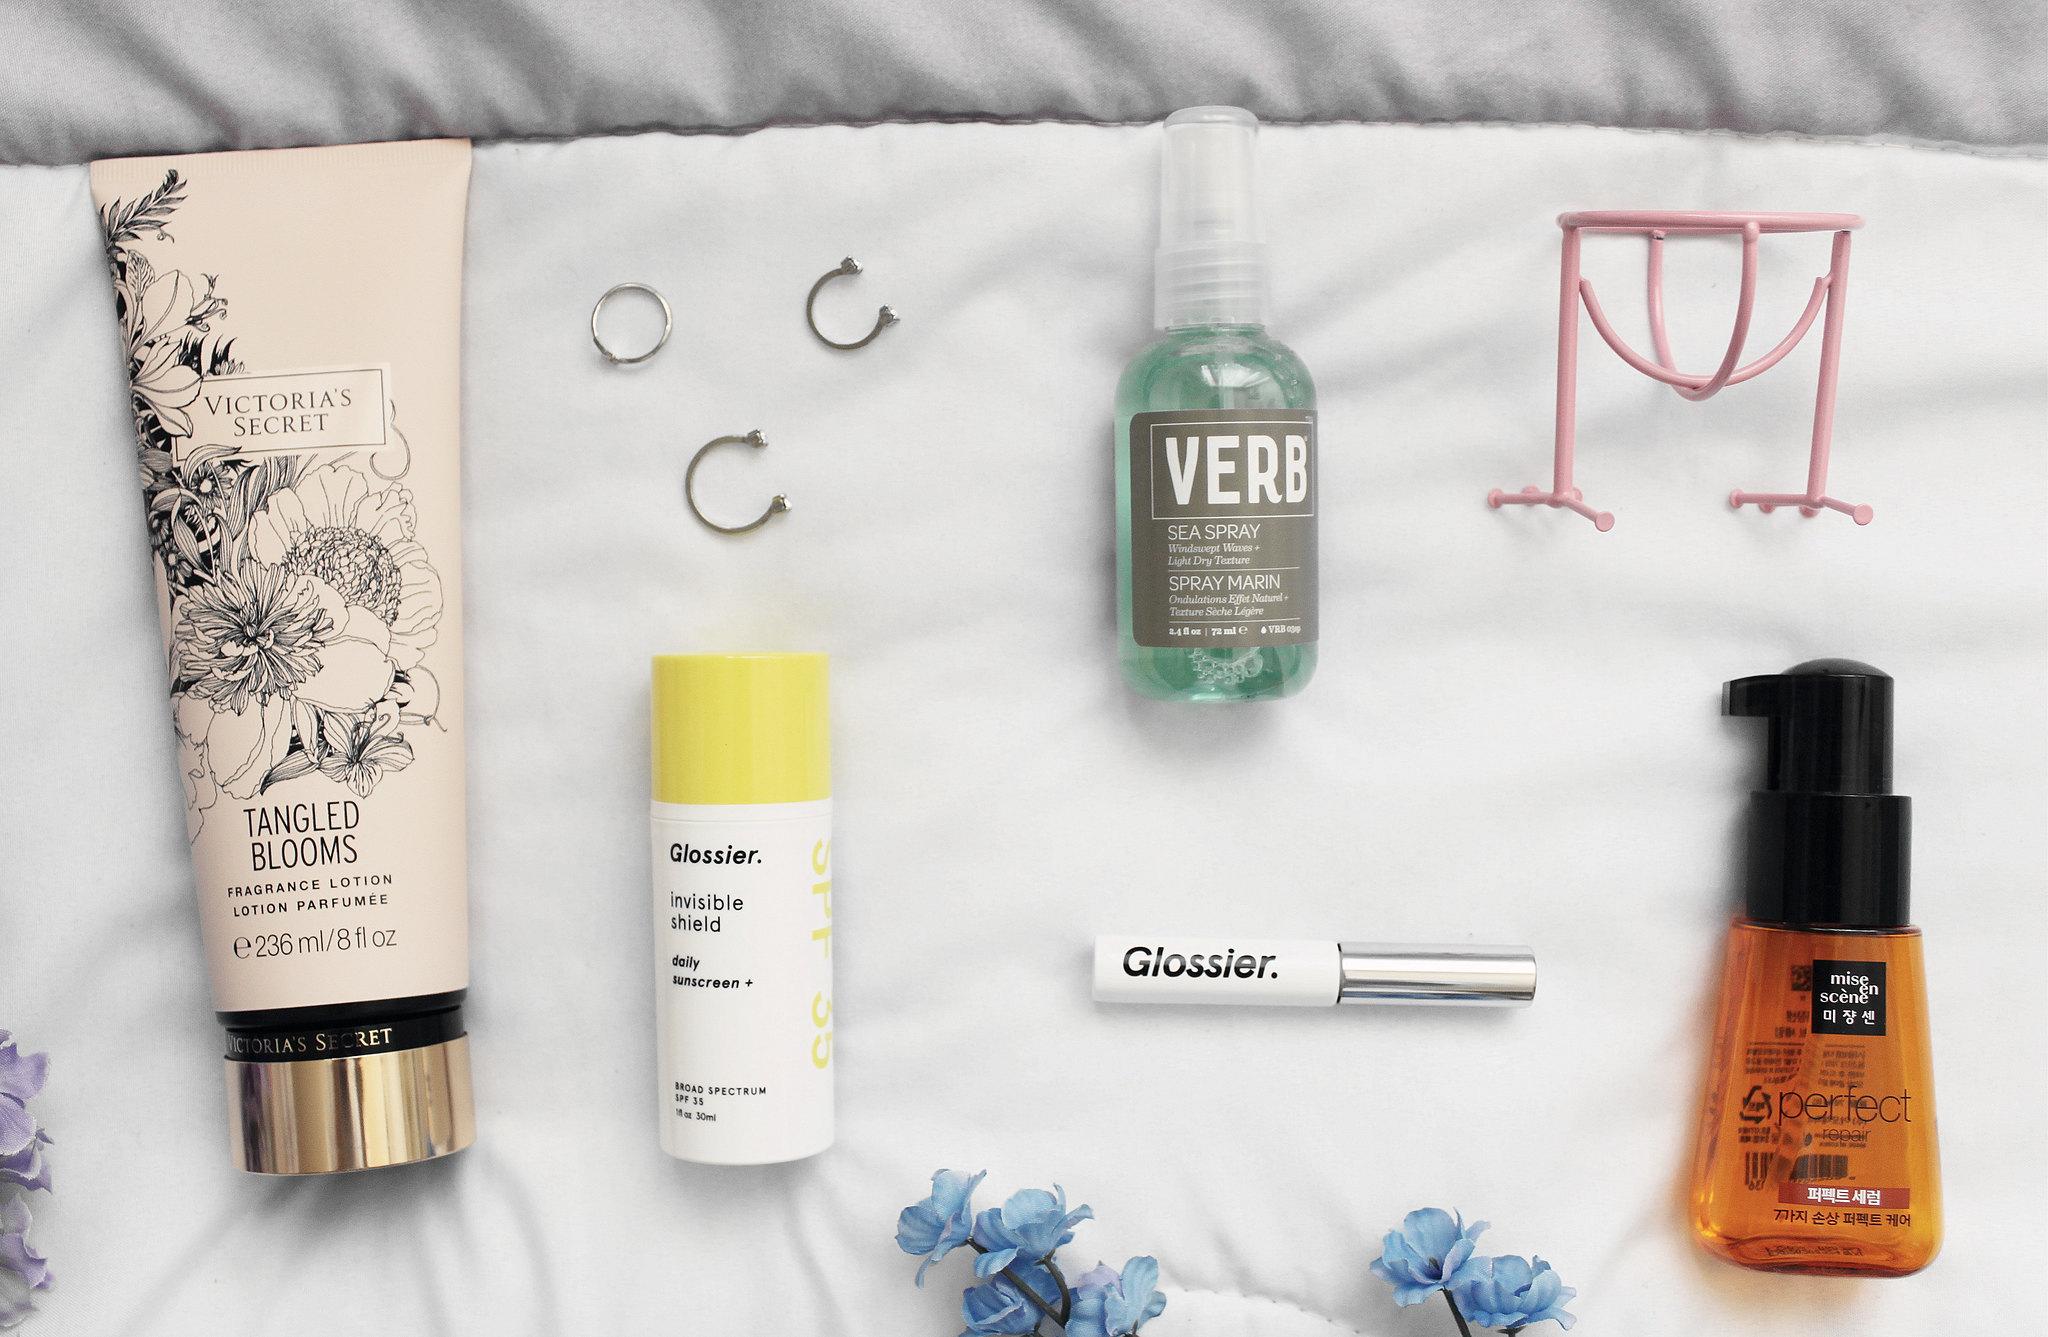 5946-beauty-makeup-skincare-sephora-vibrouge-glossier-victoriassecret-verb-yesstyle-clothestoyouuu-elizabeeetht-flatlay